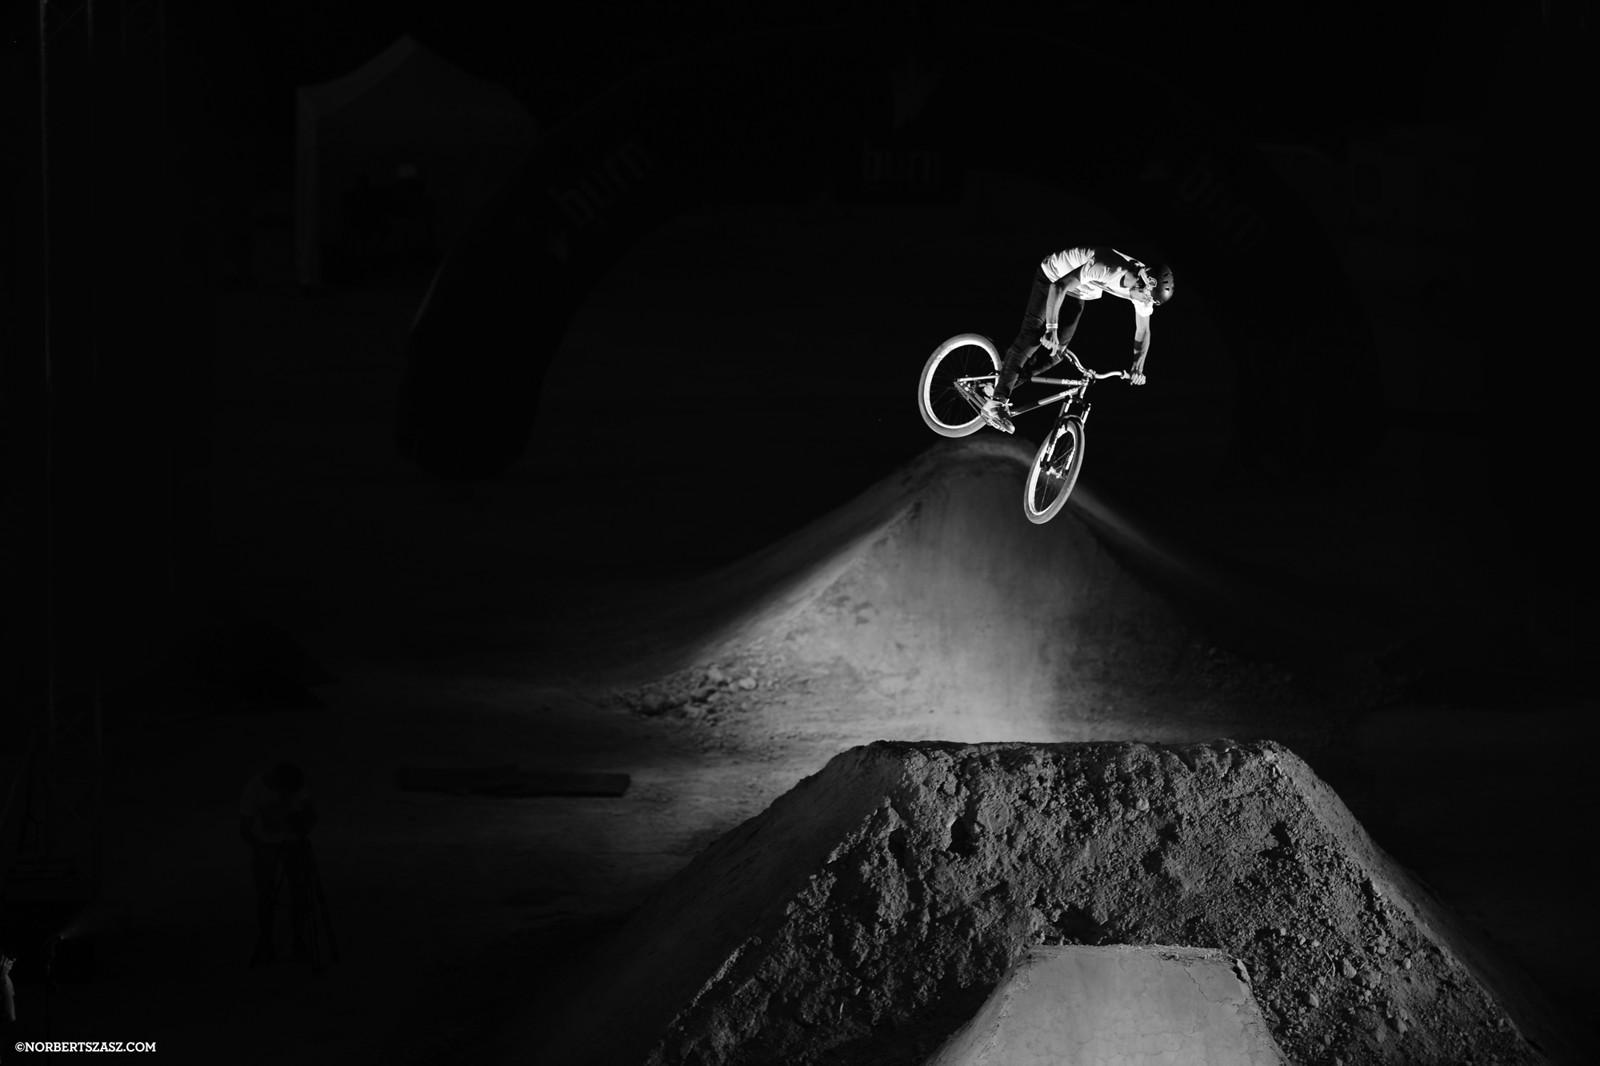 Horváth Ferenc - NorbertSzasz - Mountain Biking Pictures - Vital MTB